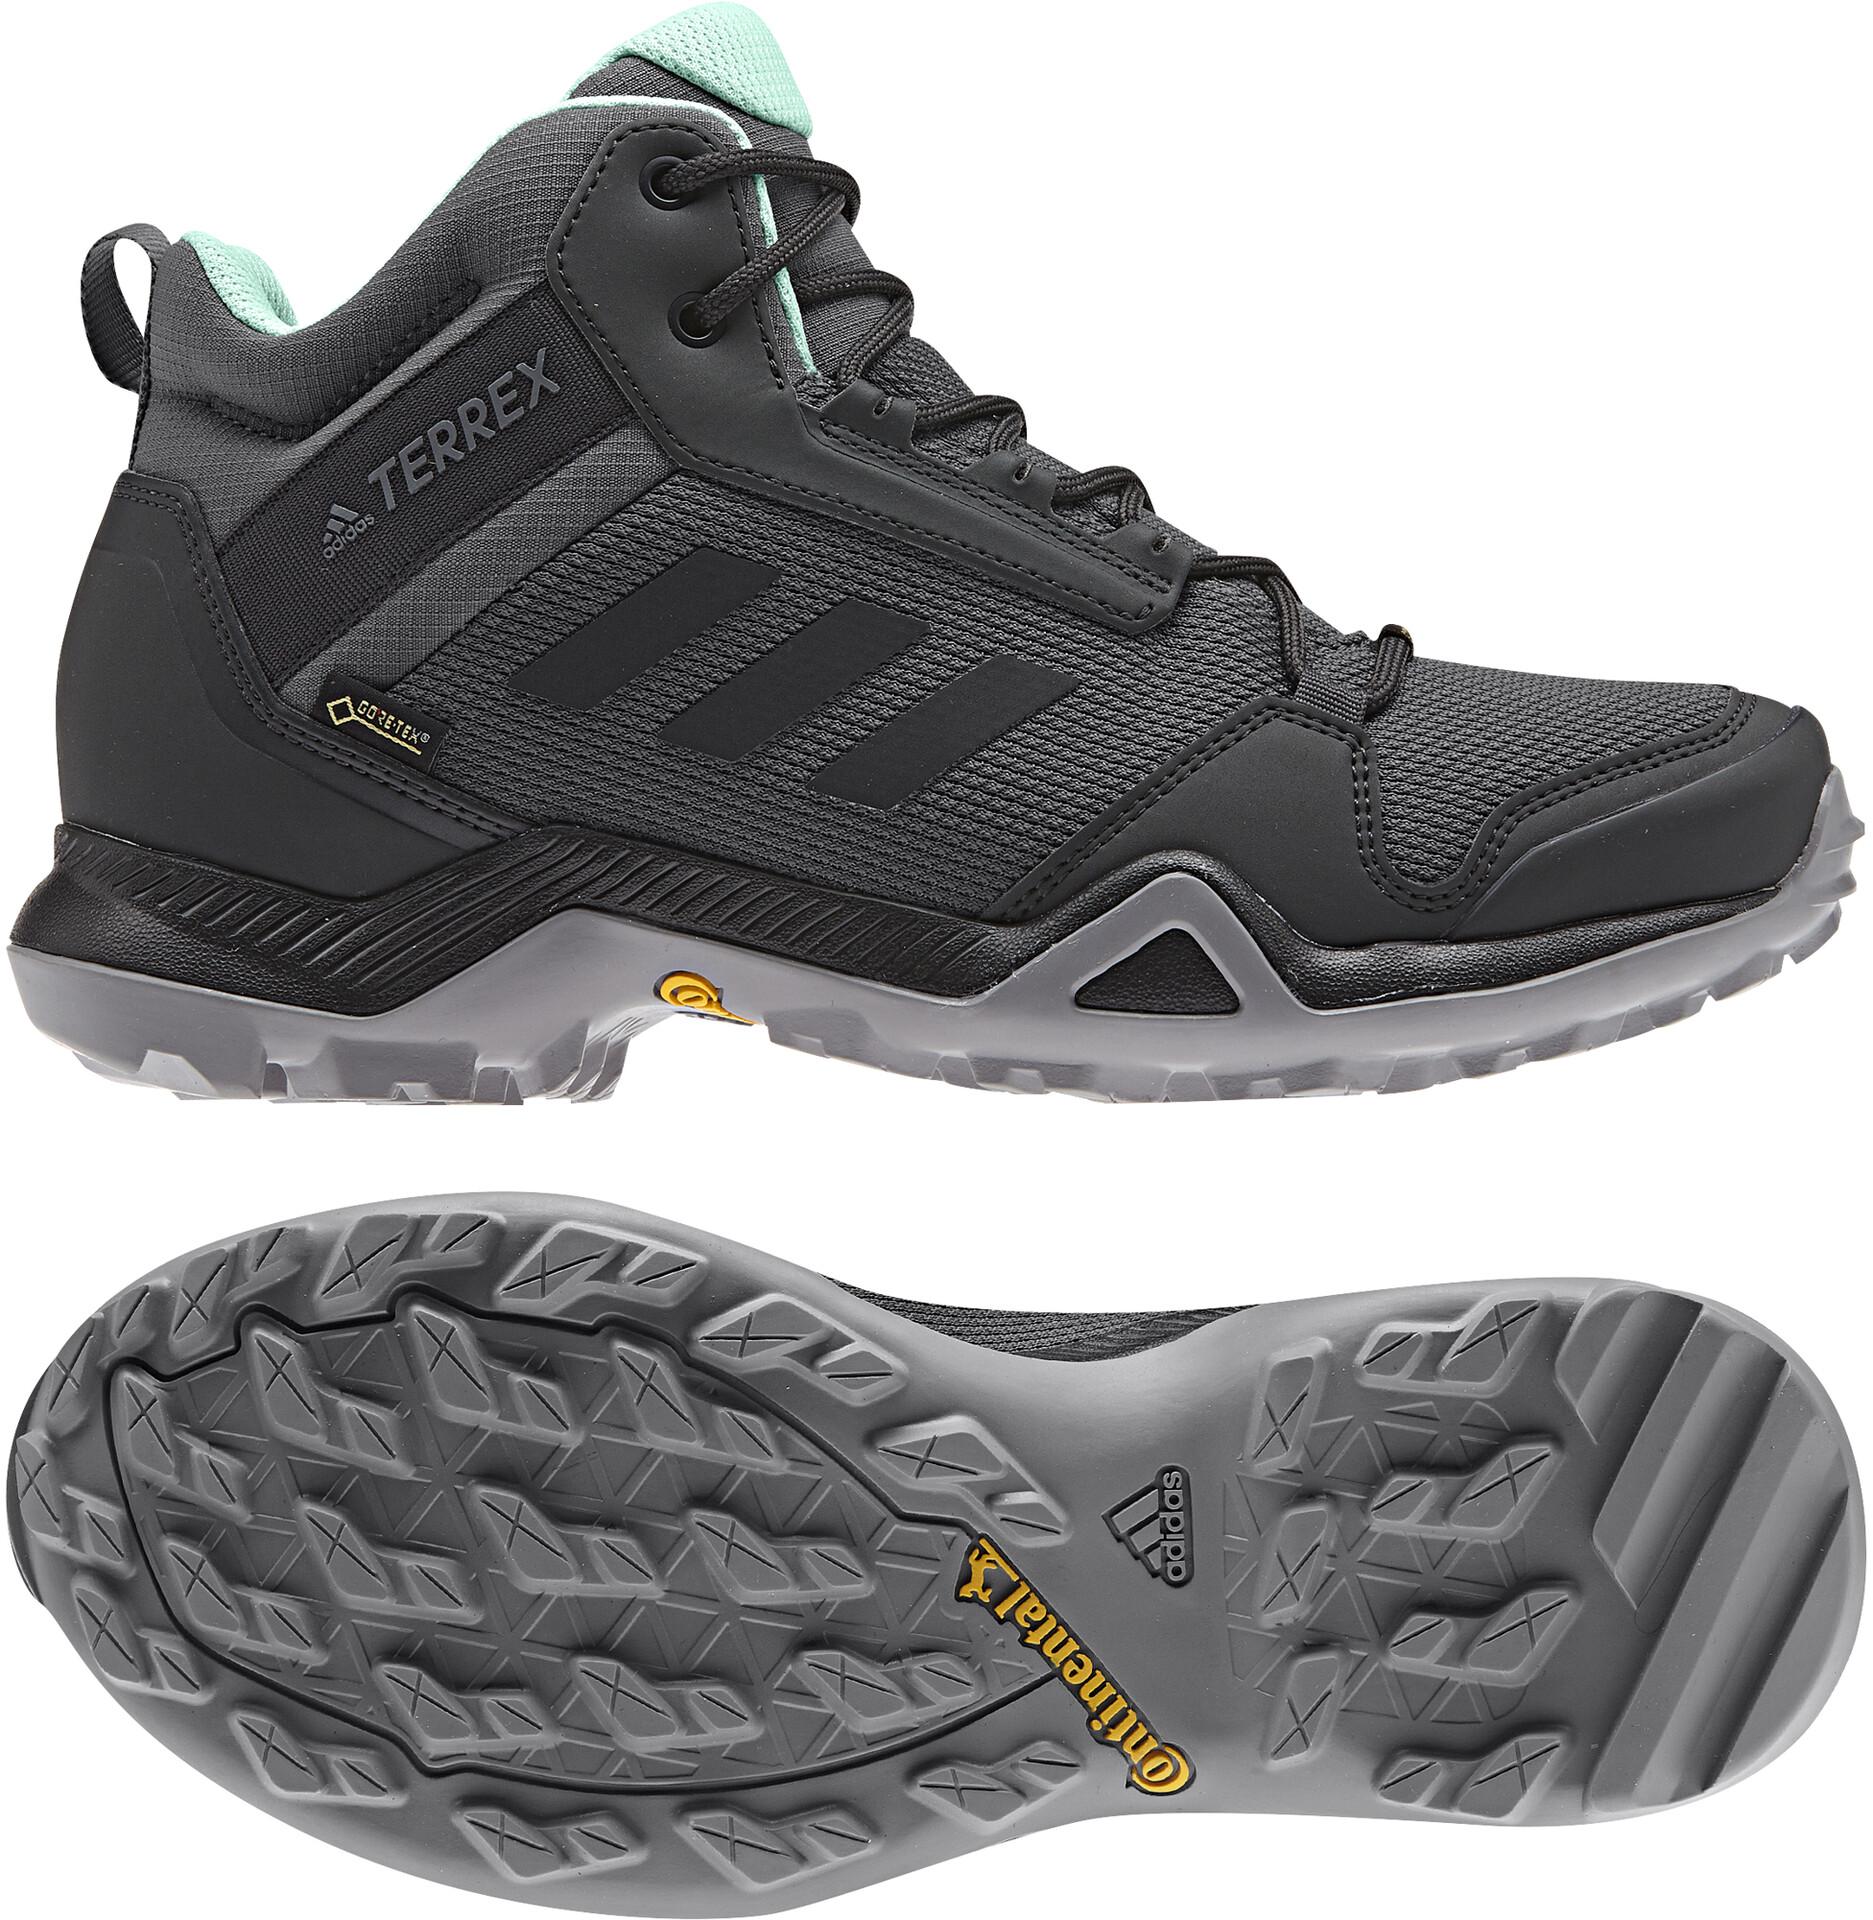 Mid Fivecore Ax3 Shoes Damen Grey Blackclemin Adidas Gtx Terrex 9IeYEbWD2H